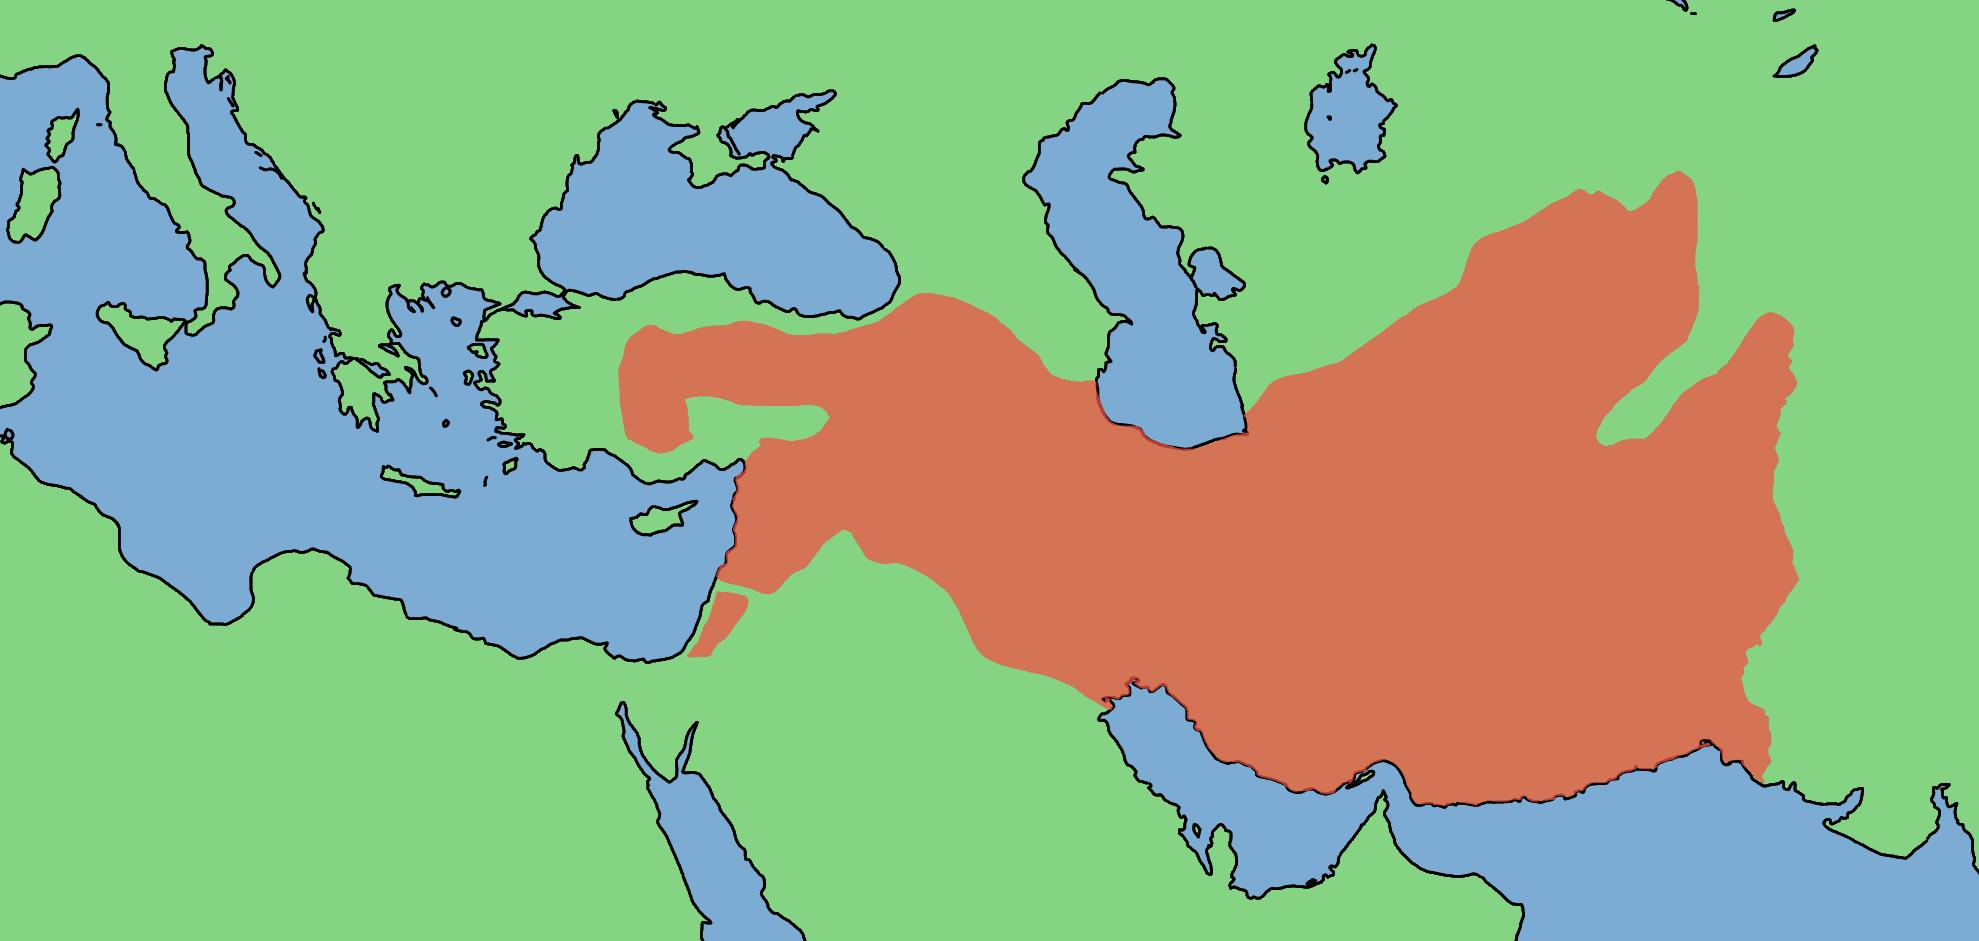 Seleucid Empire 323-360 BC